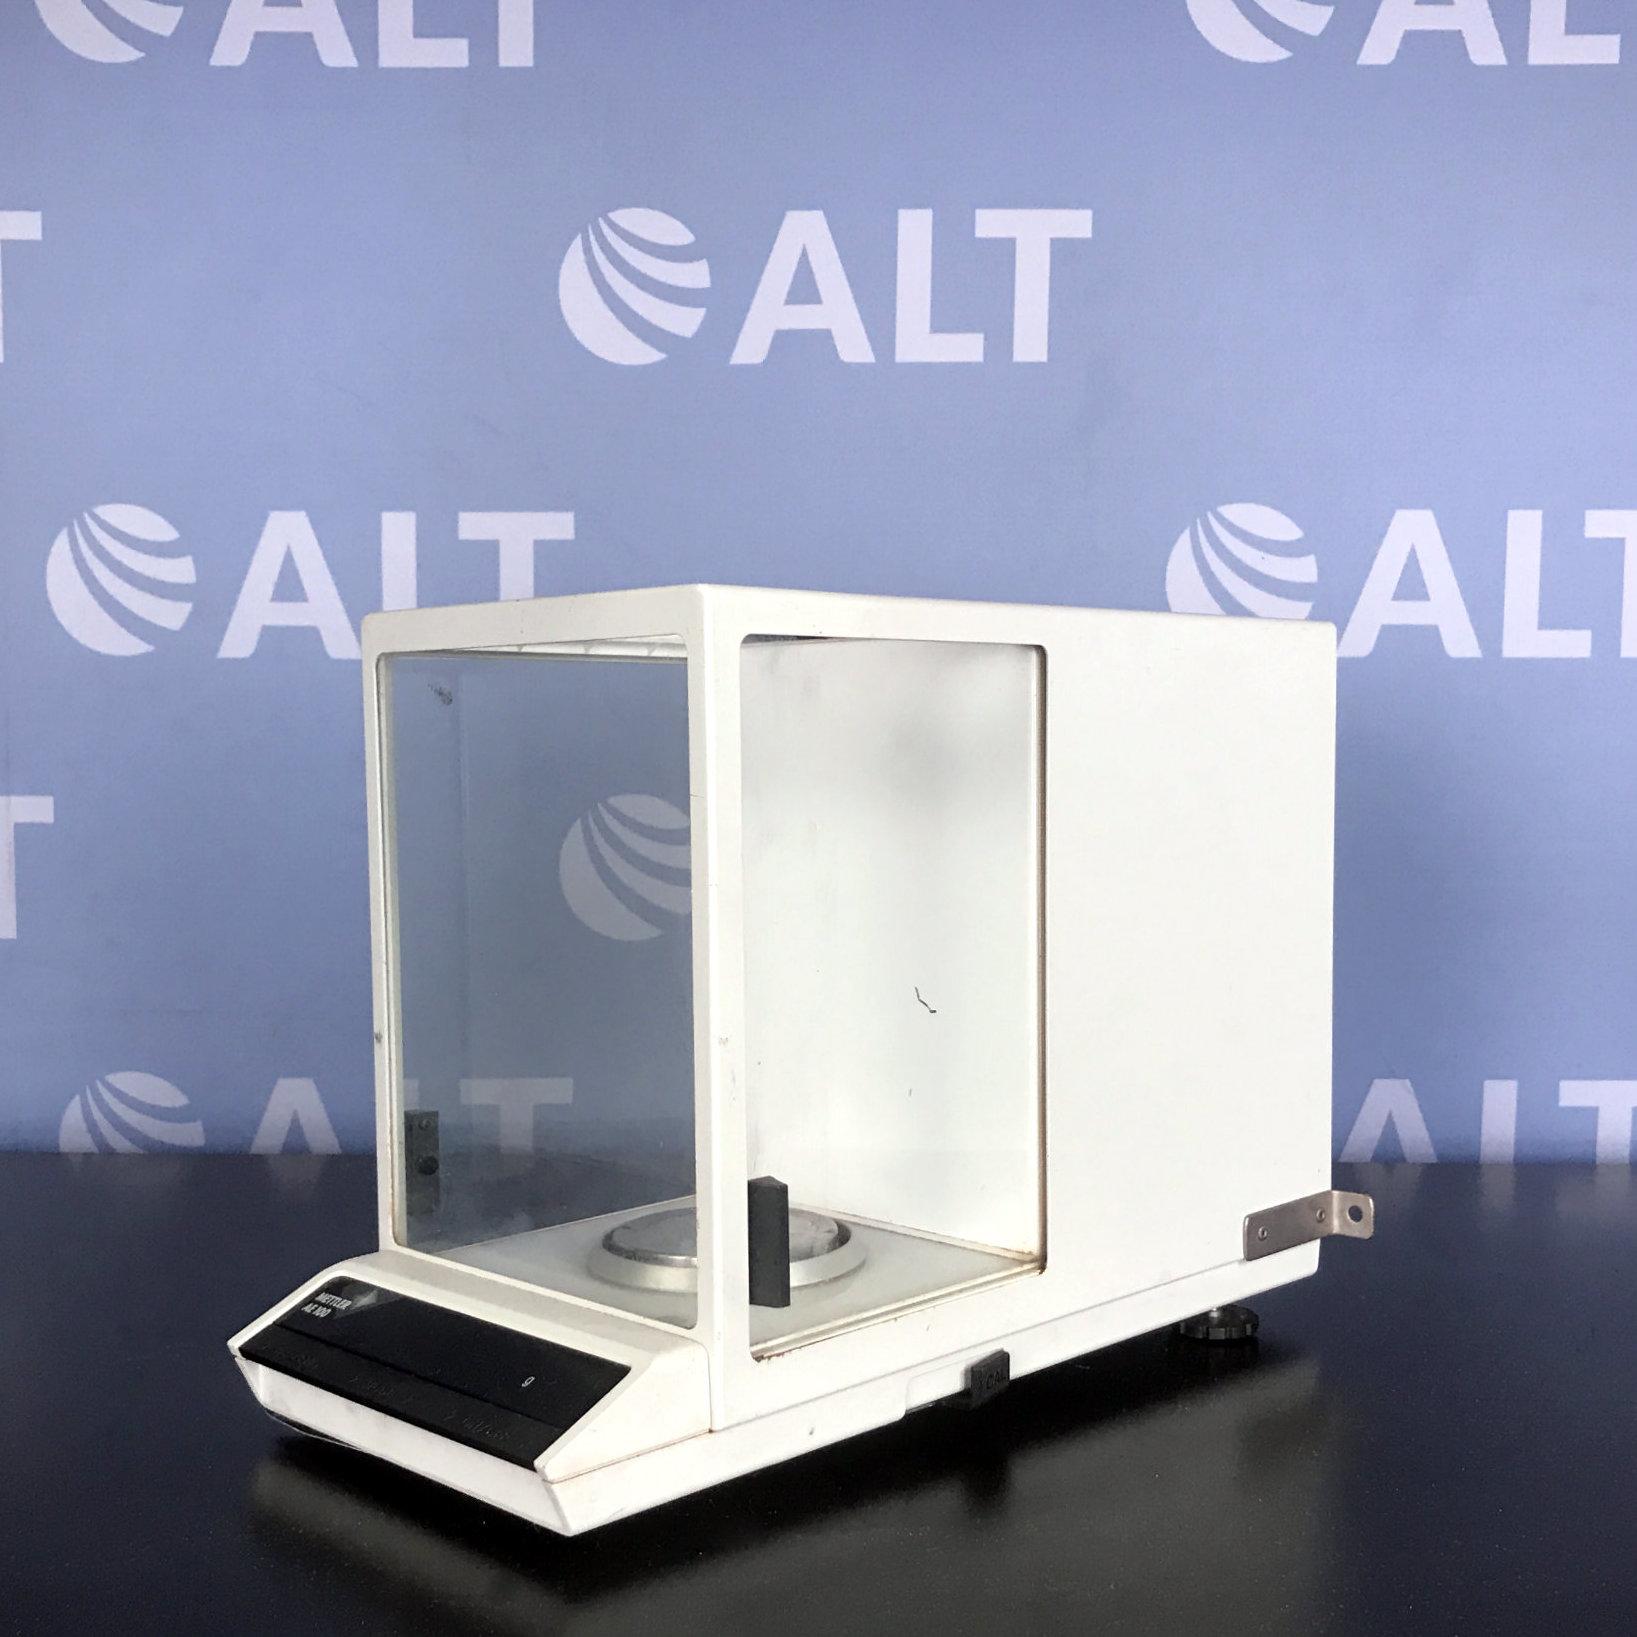 Mettler Toledo AE100-S Analytical Balance Image